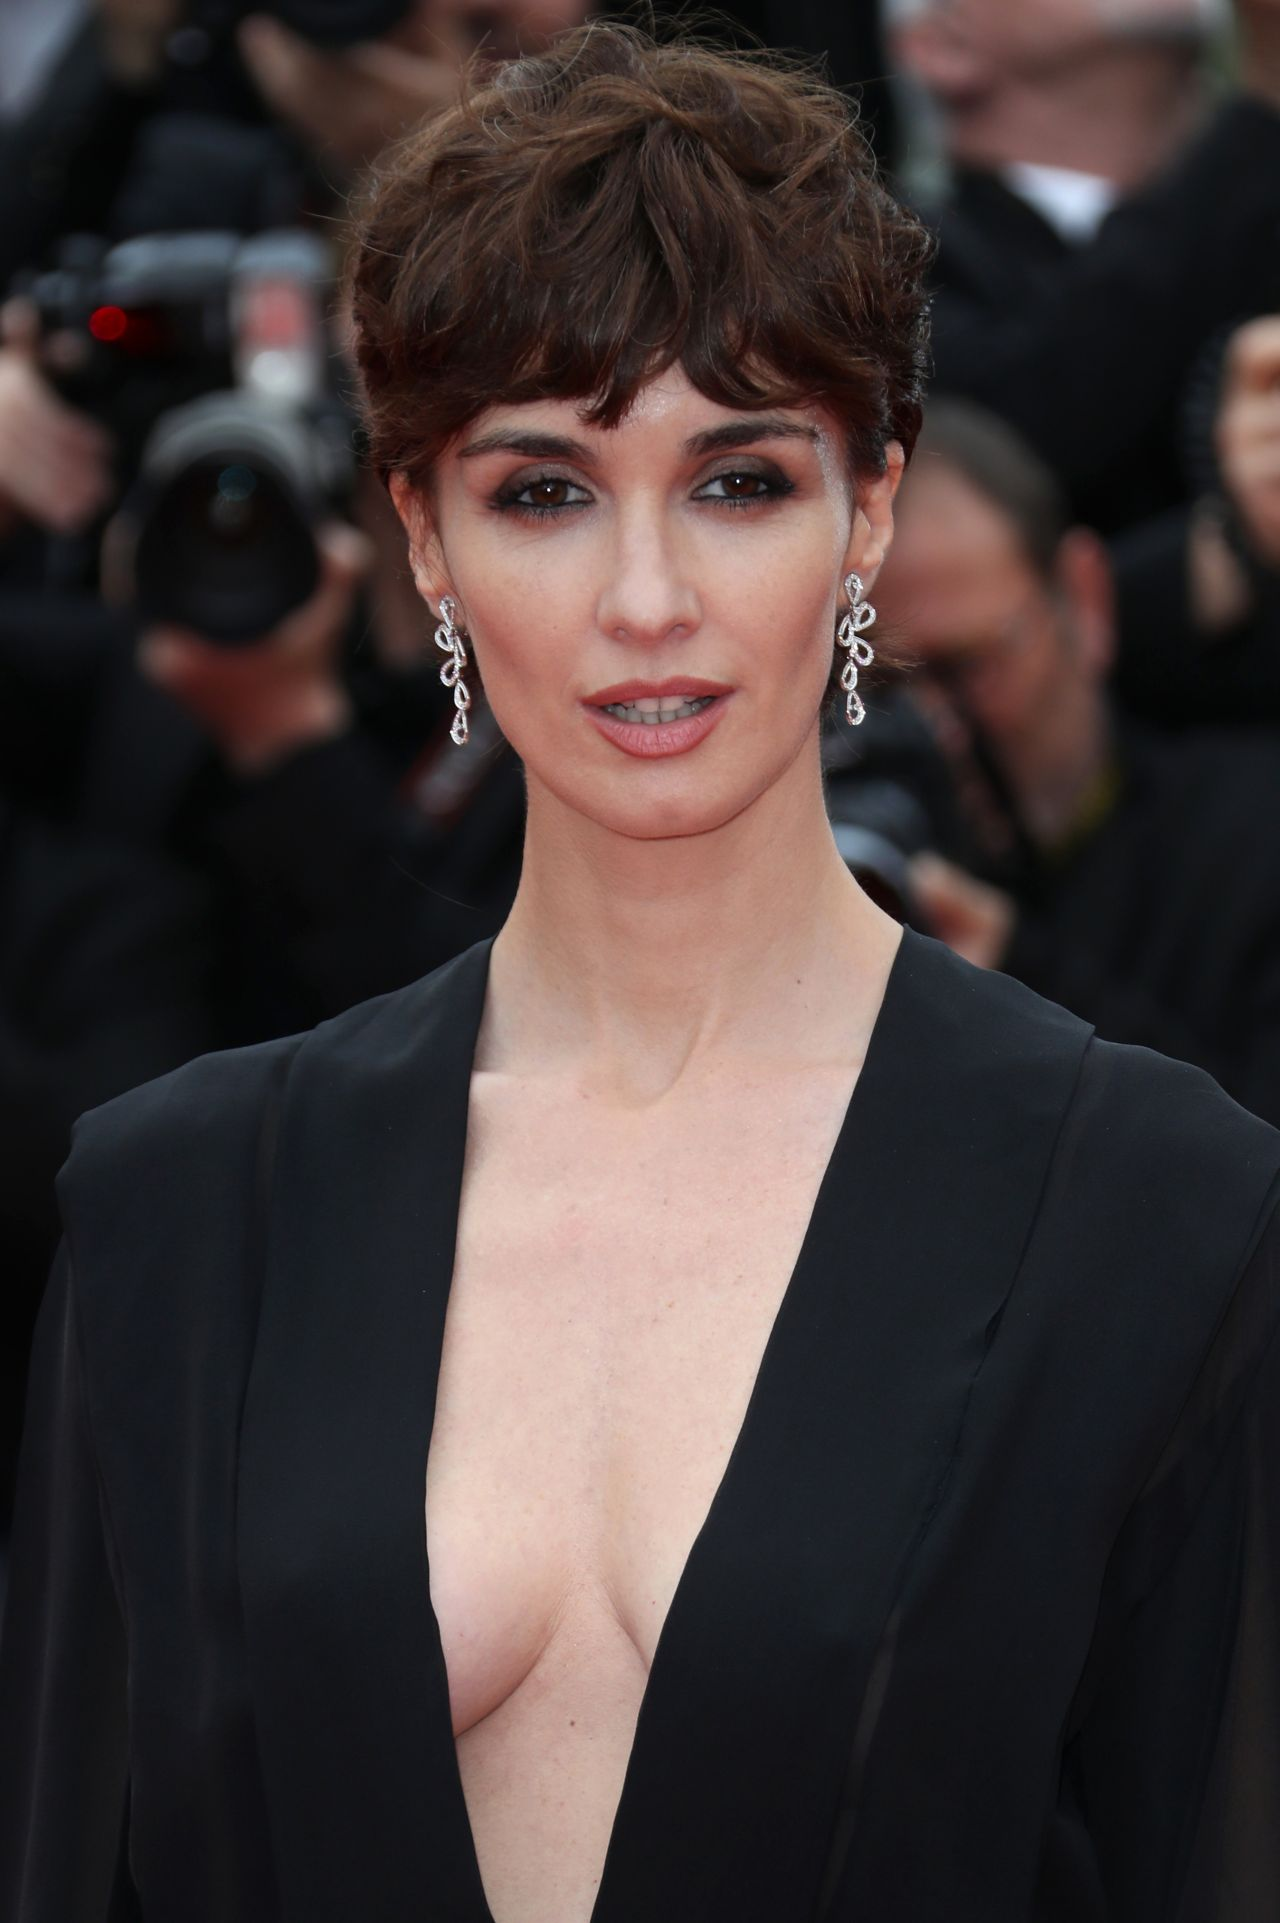 Paz Vega The BFG Screening At Cannes Film Festival 5